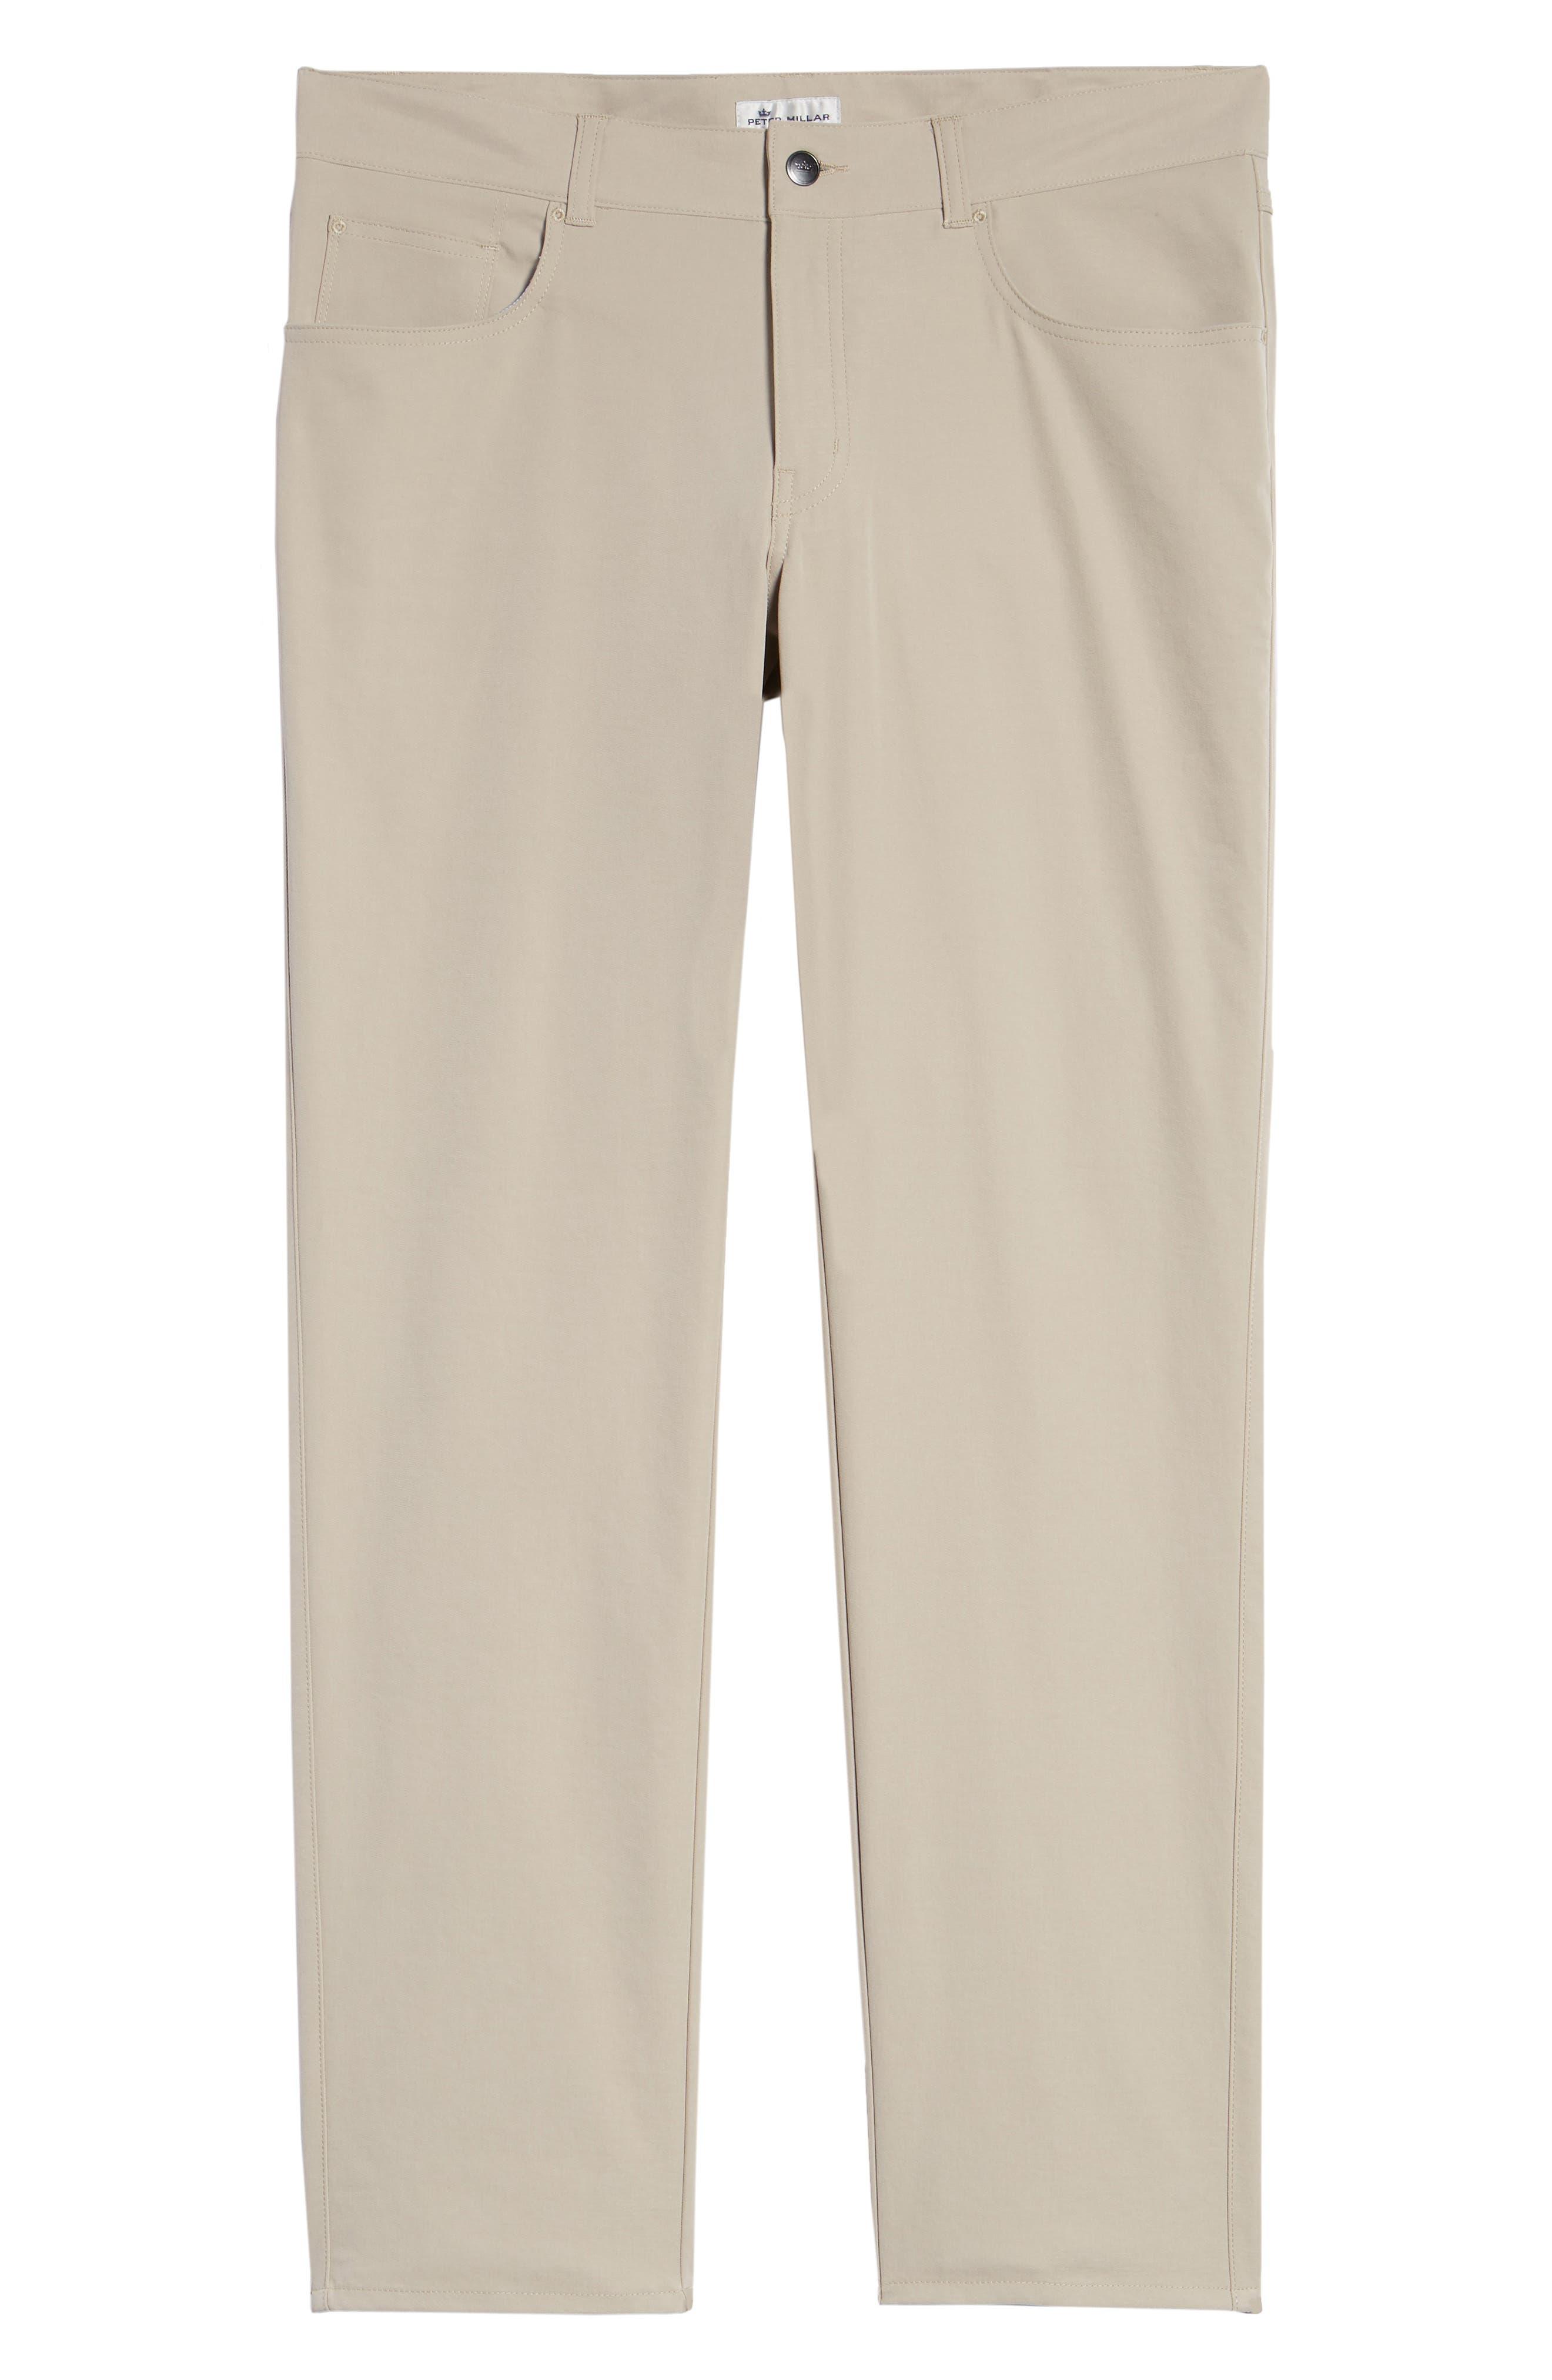 eb66 Regular Fit Performance Pants,                             Alternate thumbnail 6, color,                             BEIGE